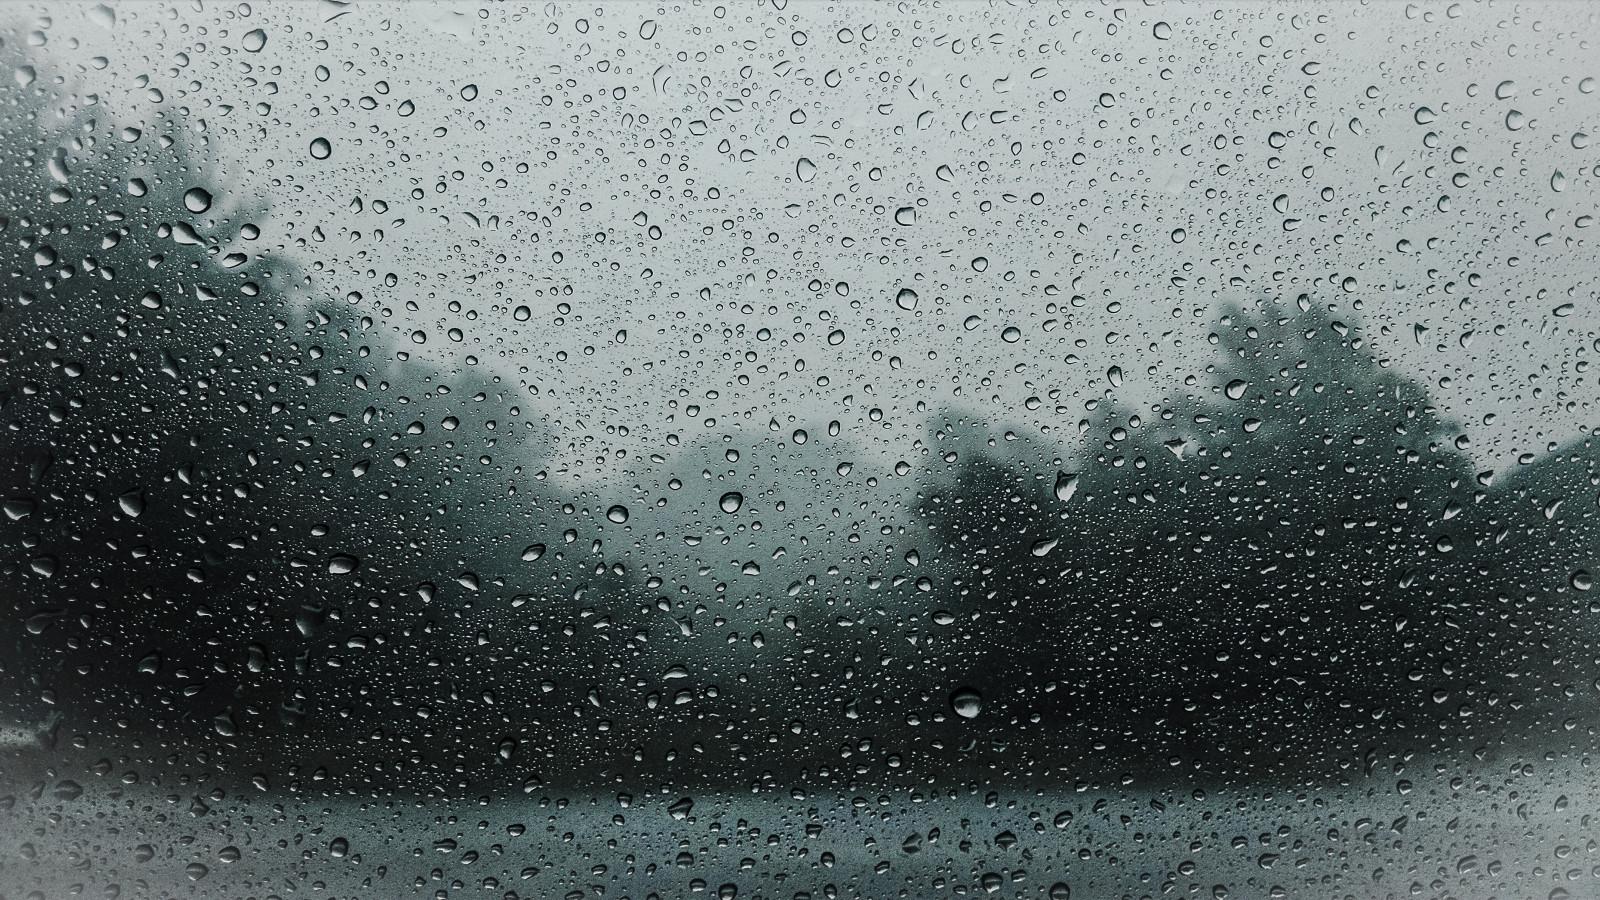 Дедушке, картинка дождя на стекле